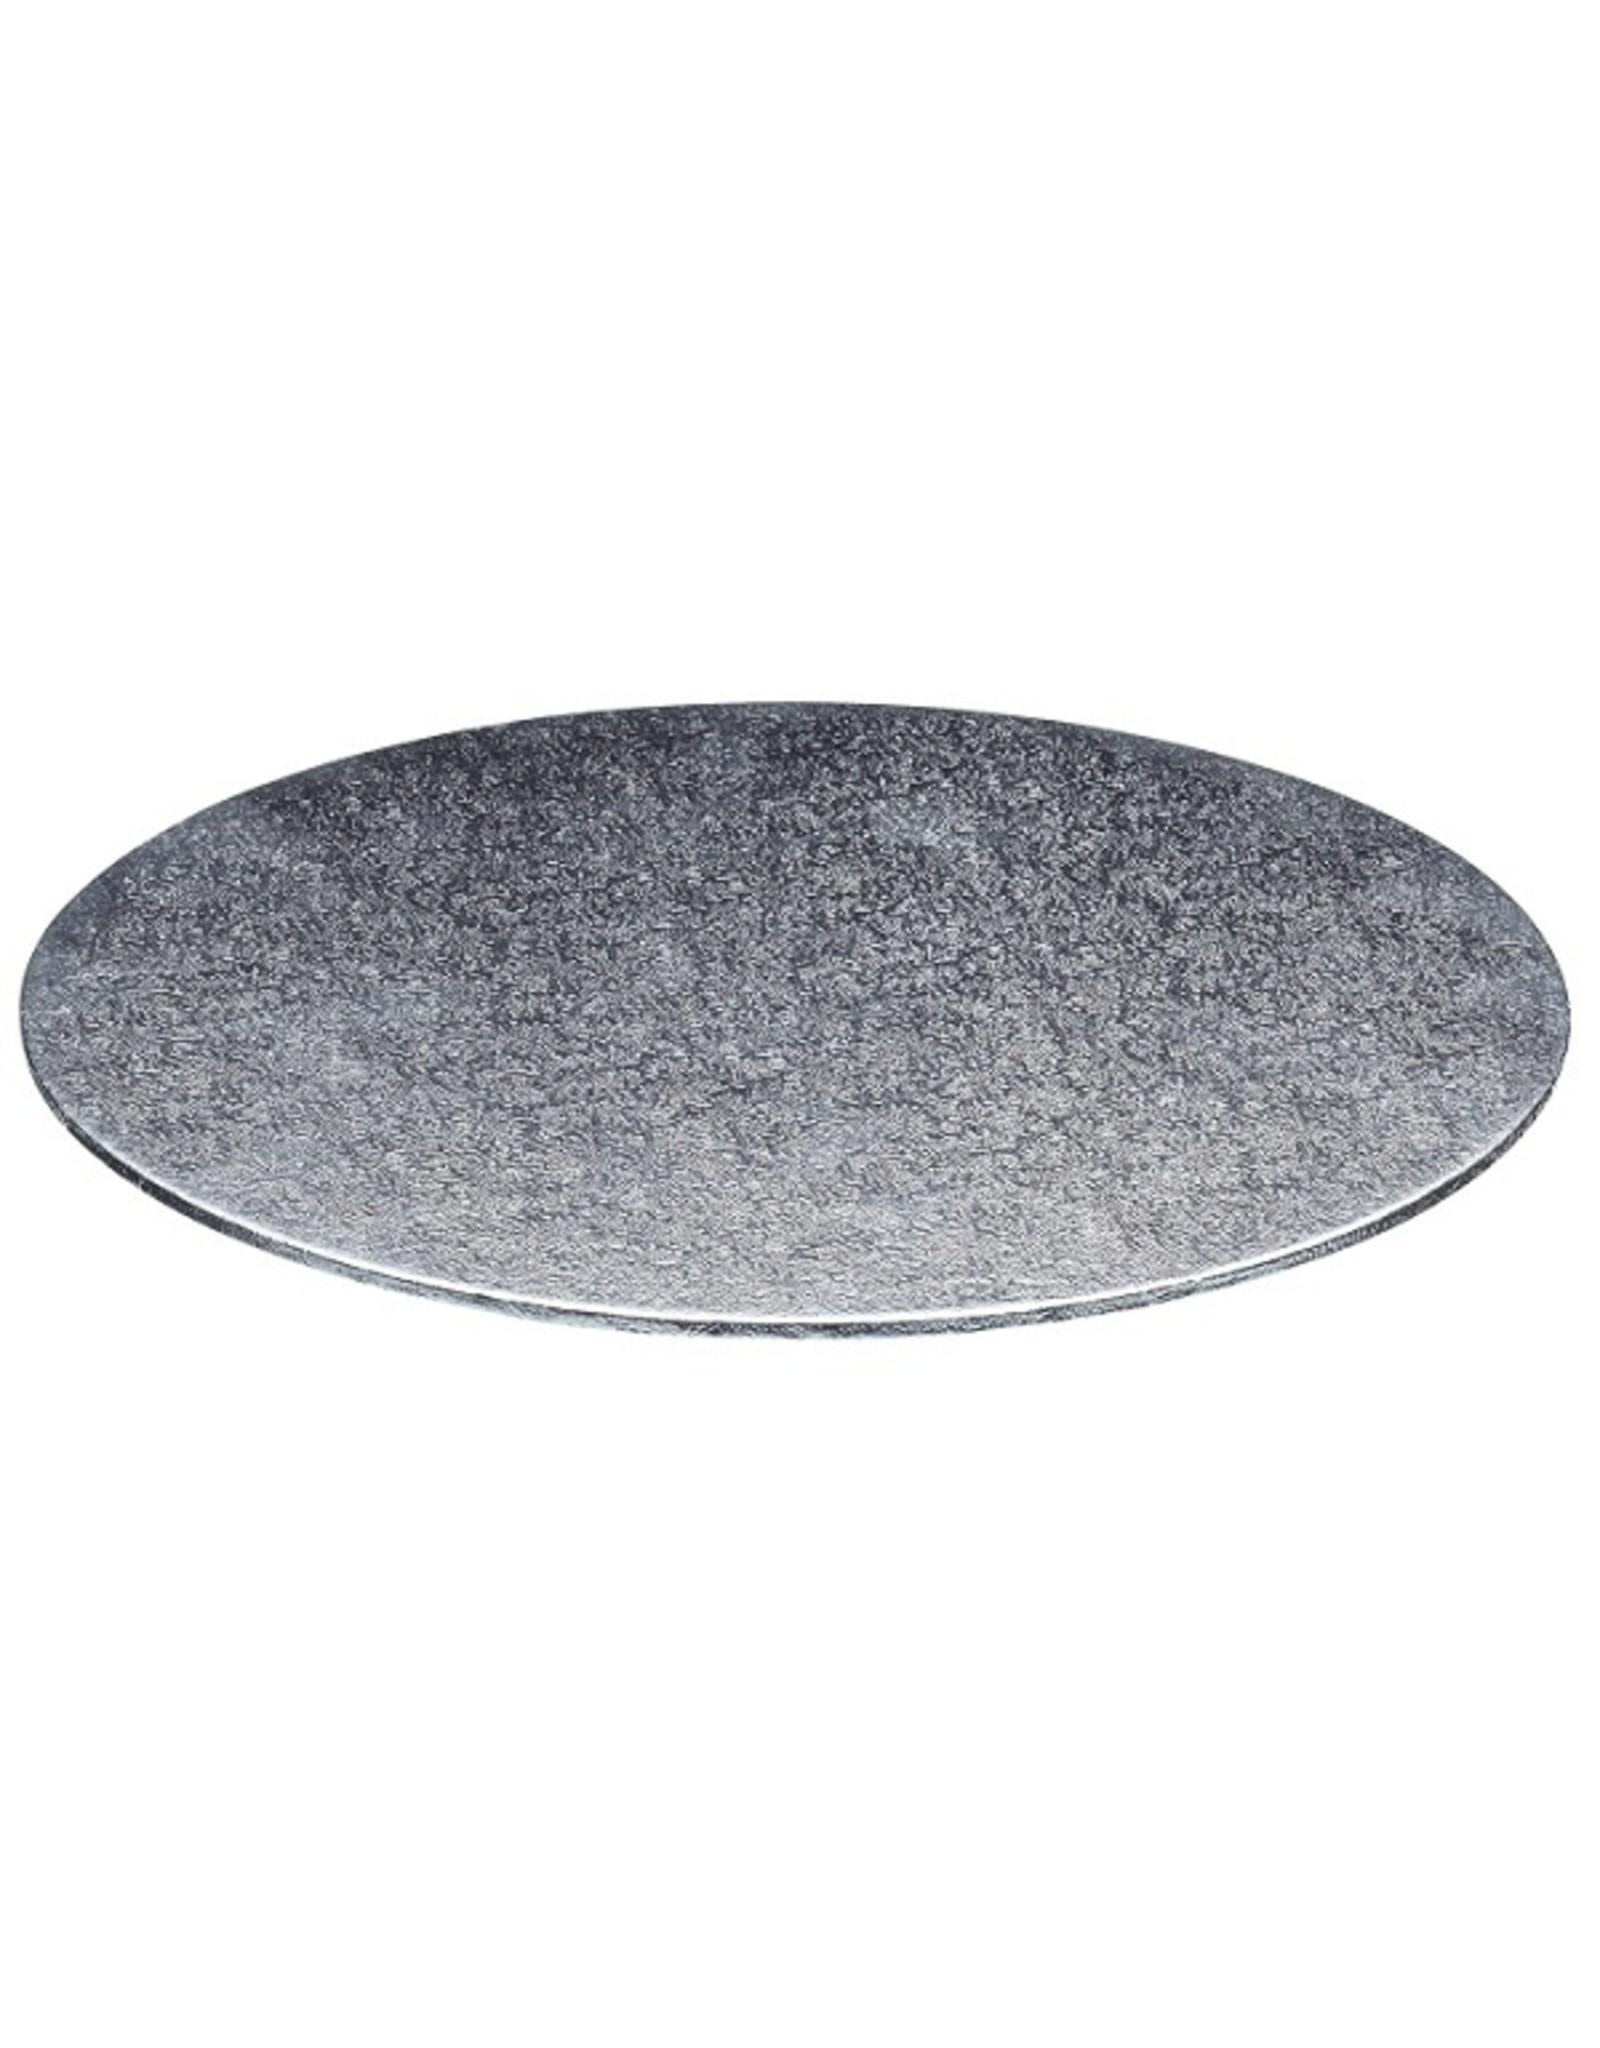 Cake boards Ø254 mm - silver (per 10 pieces)